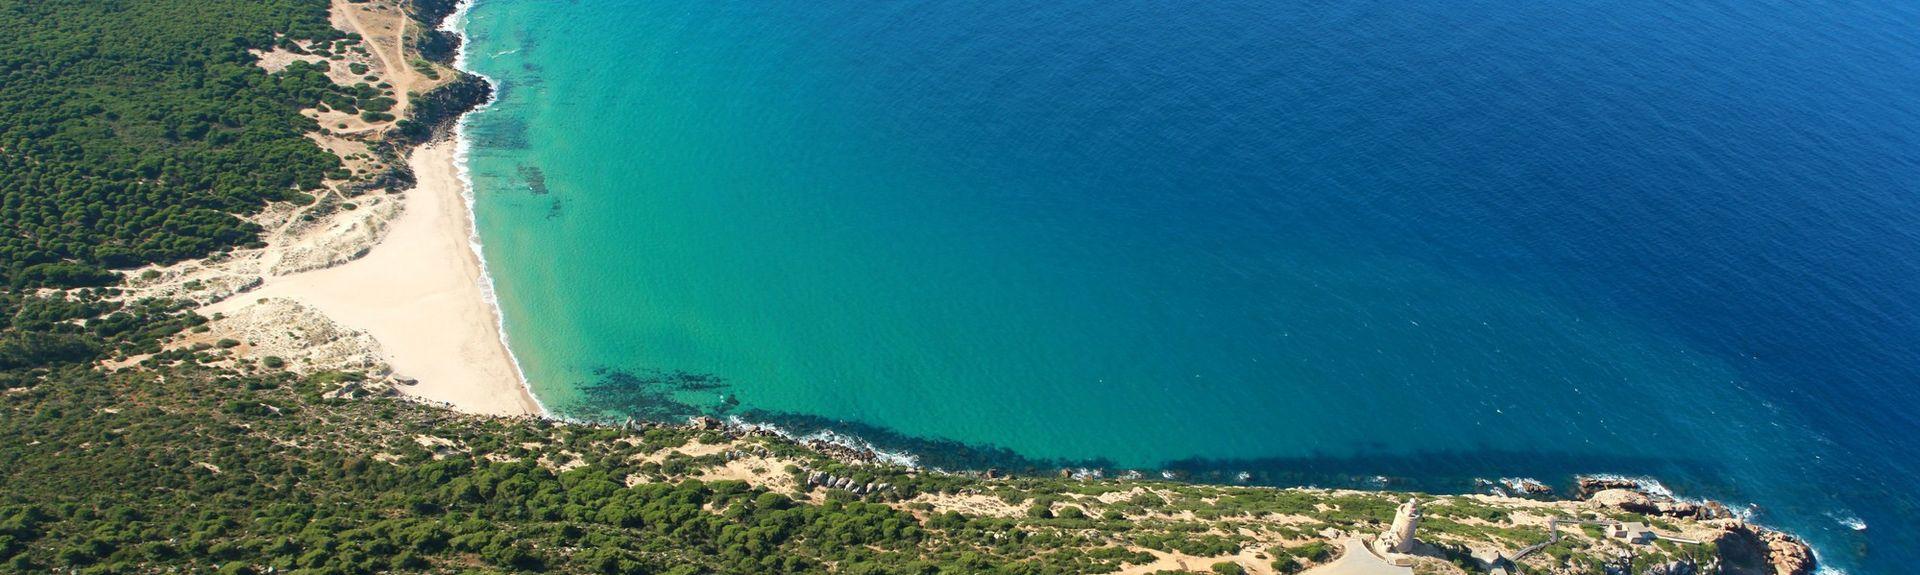 Cabo de Trafalgar, Barbate, Andaluzia, Espanha